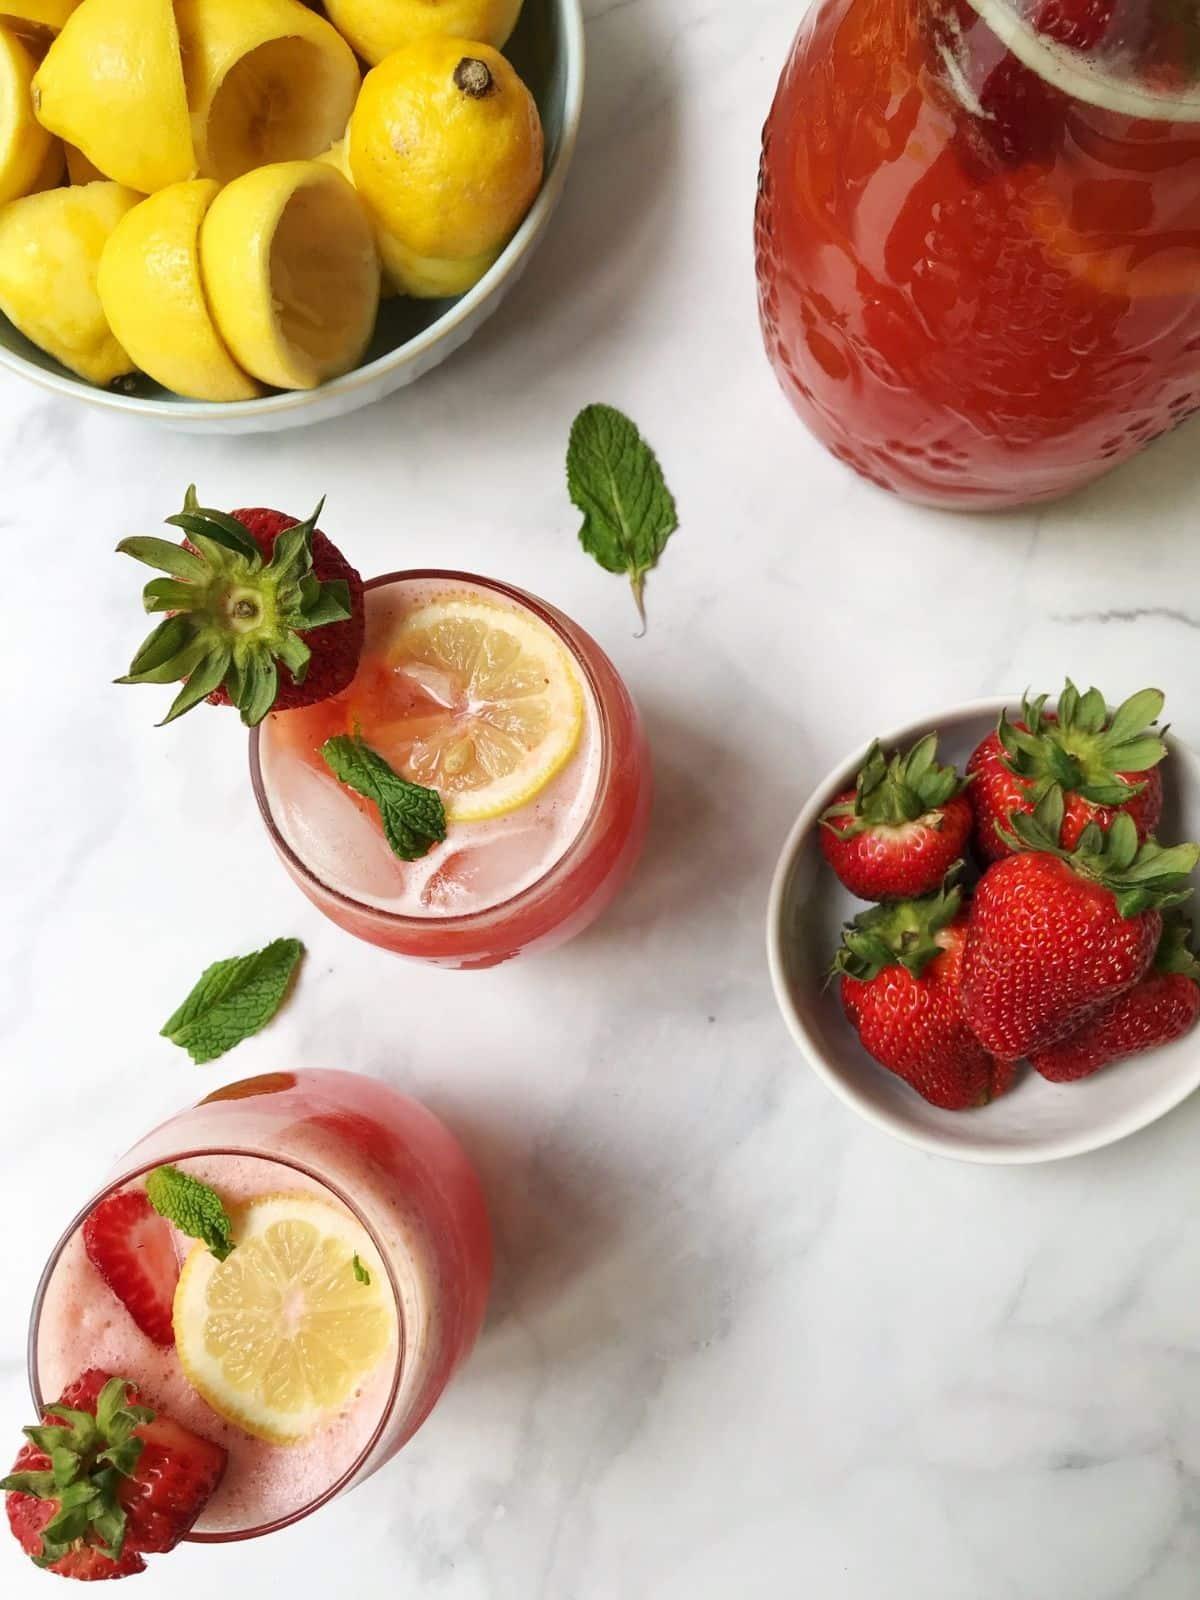 pitcher of lemonade, glasses, and lemons and strawberries